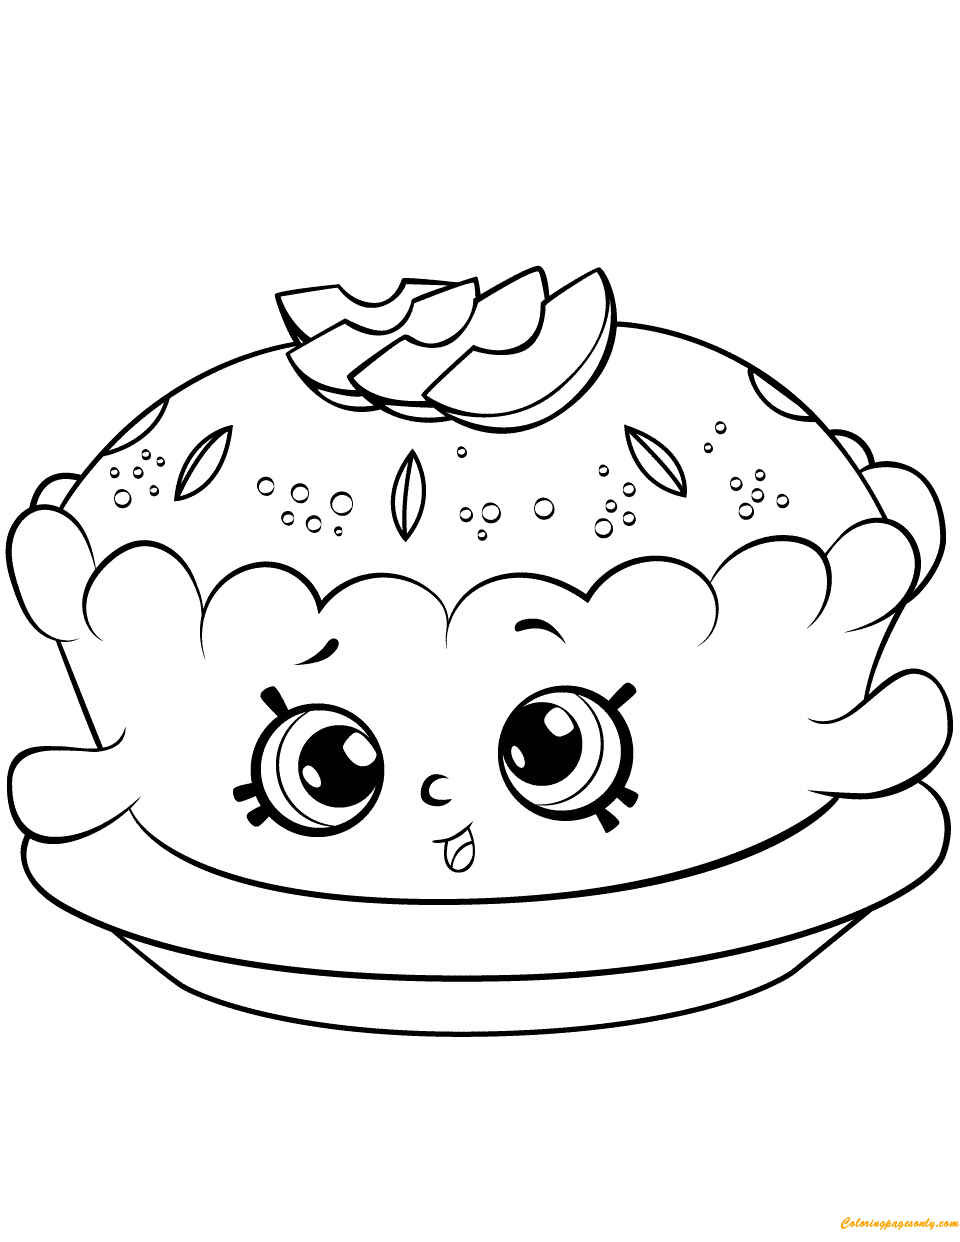 The Very Hungry Caterpillar  dltkteachcom